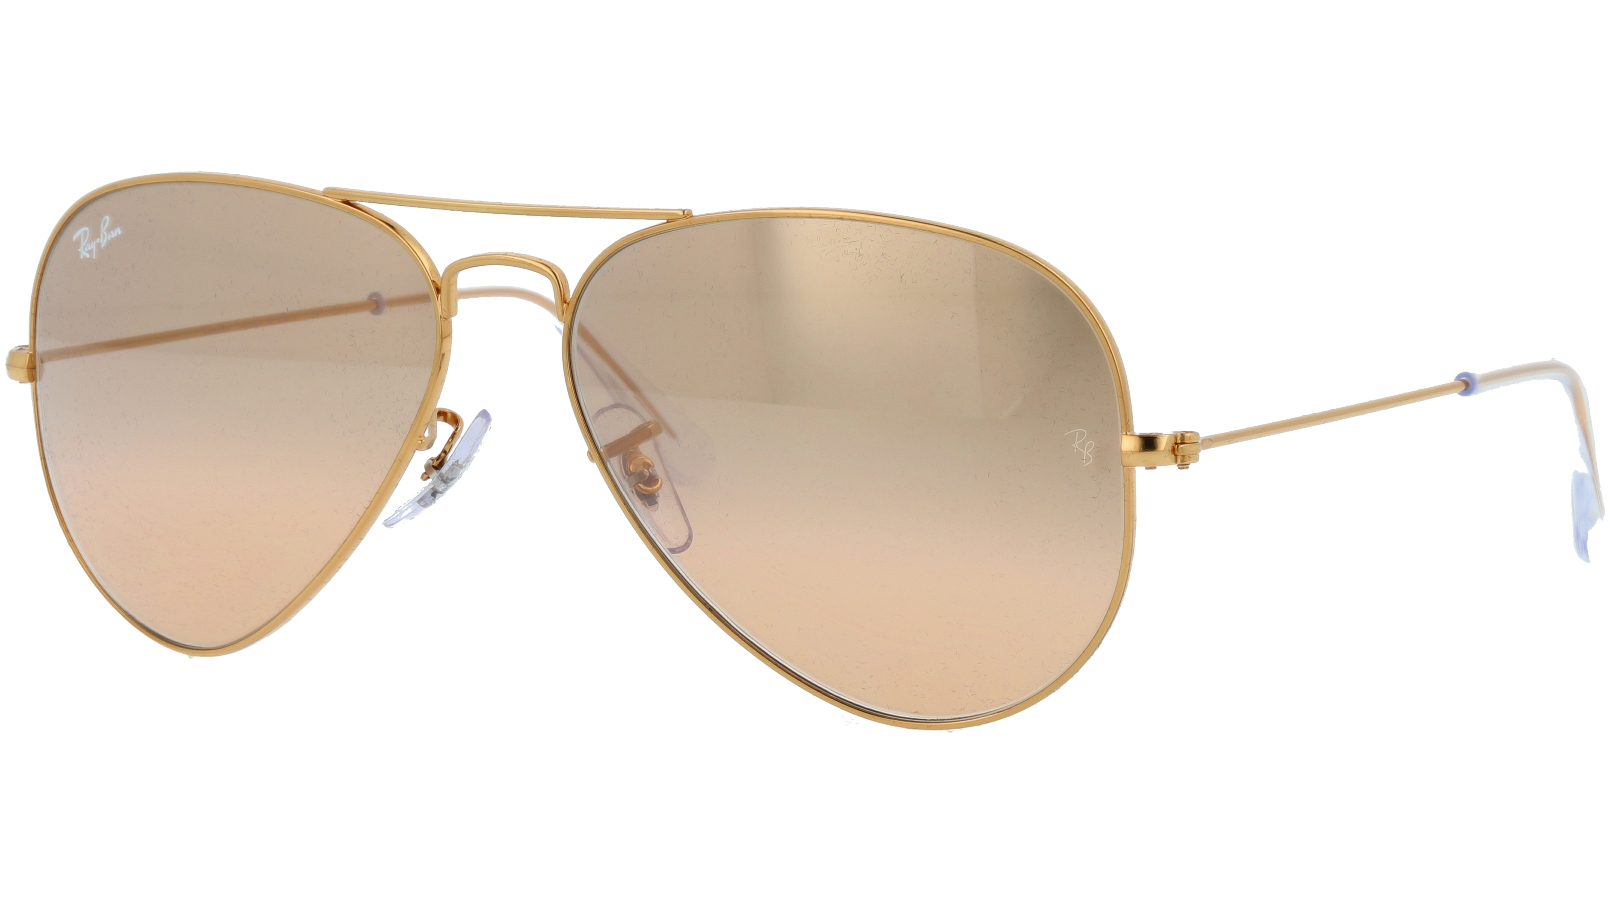 Ray-Ban RB3025 001/3E 58 Arista Pilot Sunglasses